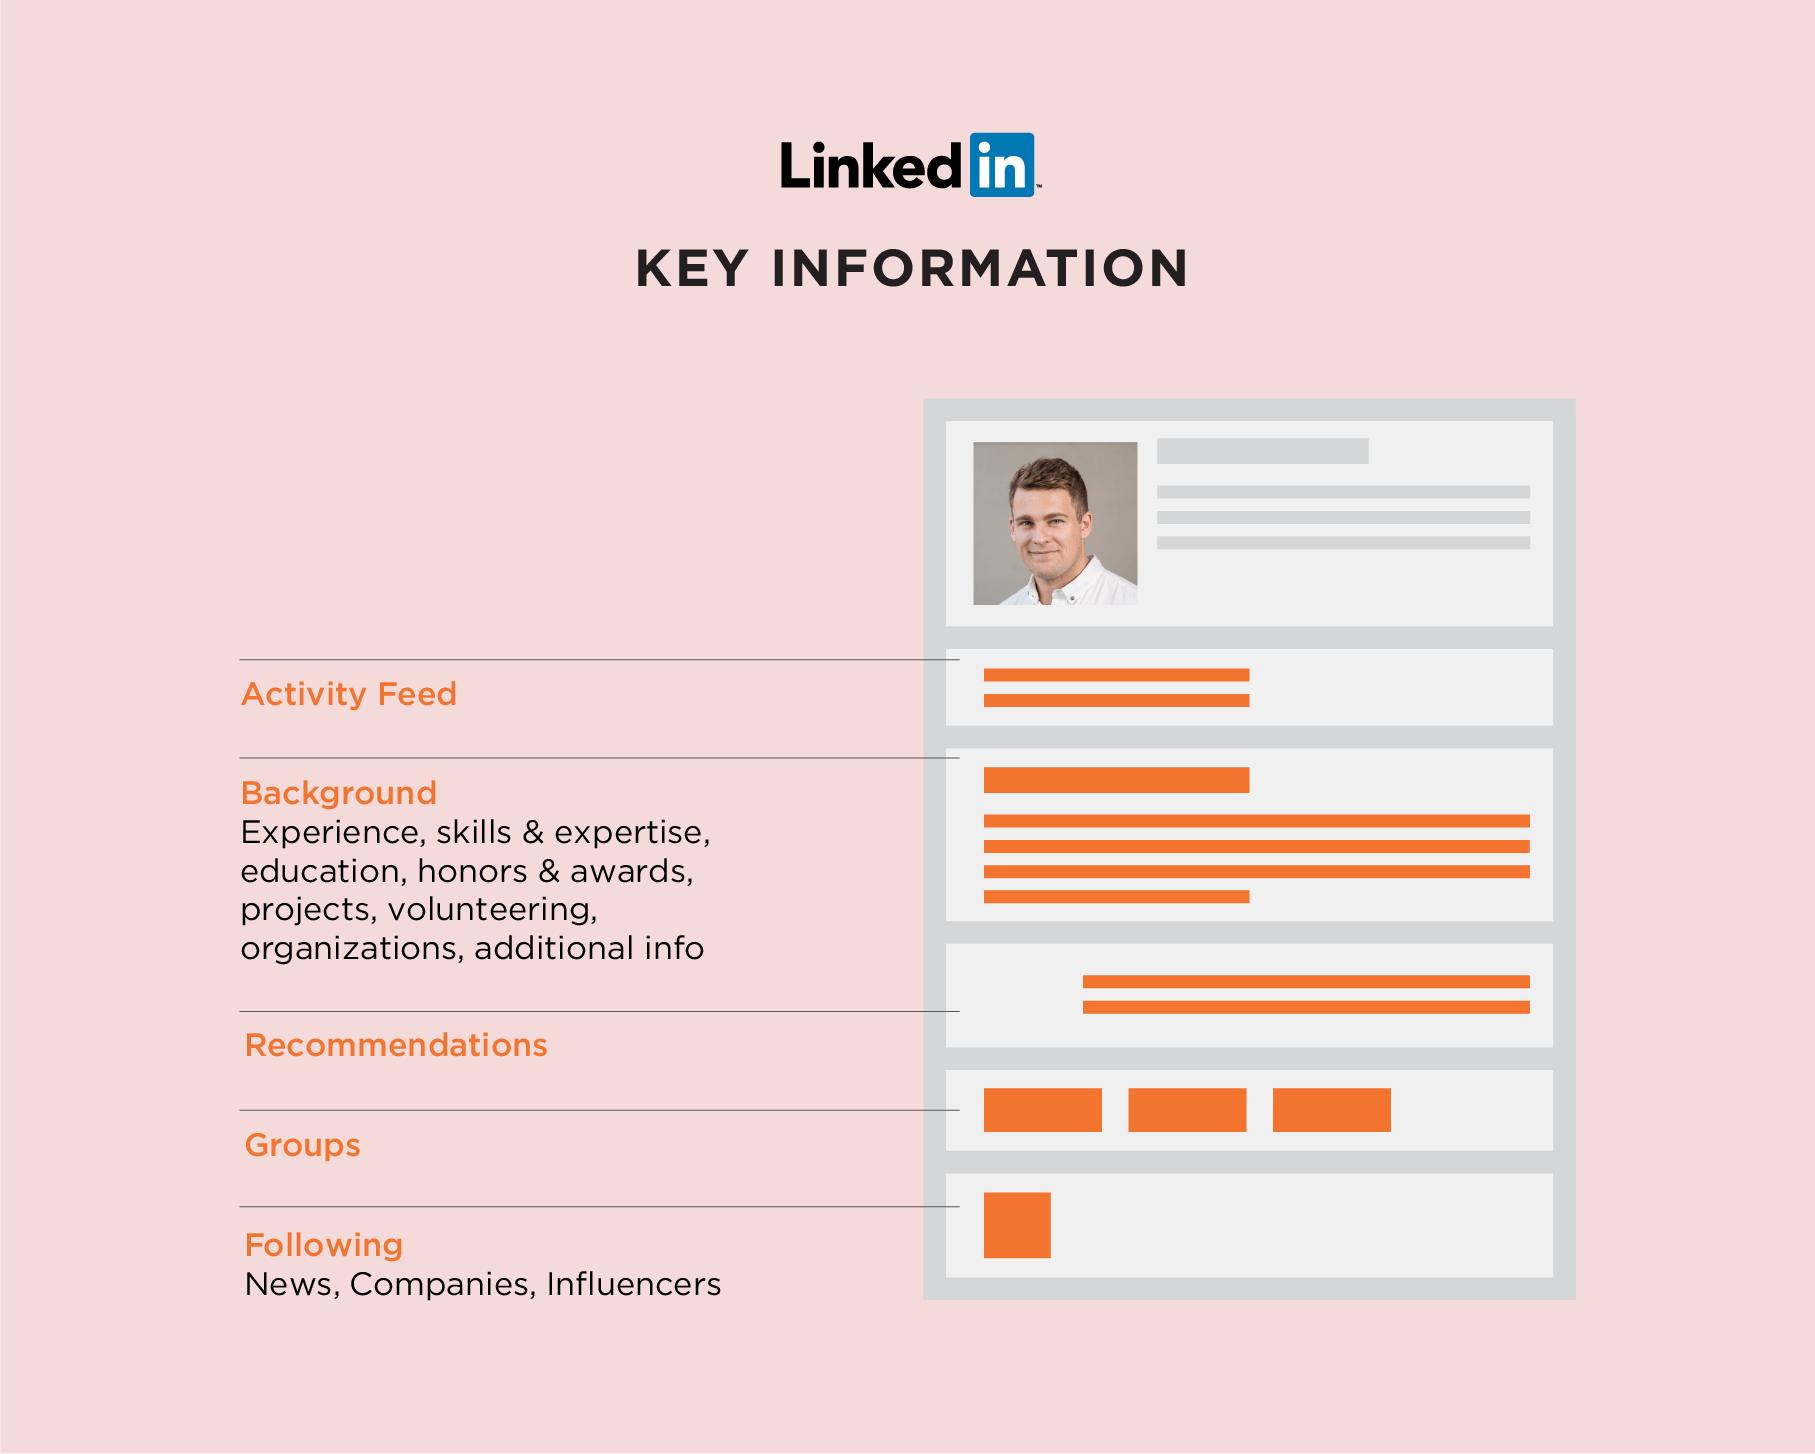 Create a LinkedIn profile and update it regularly